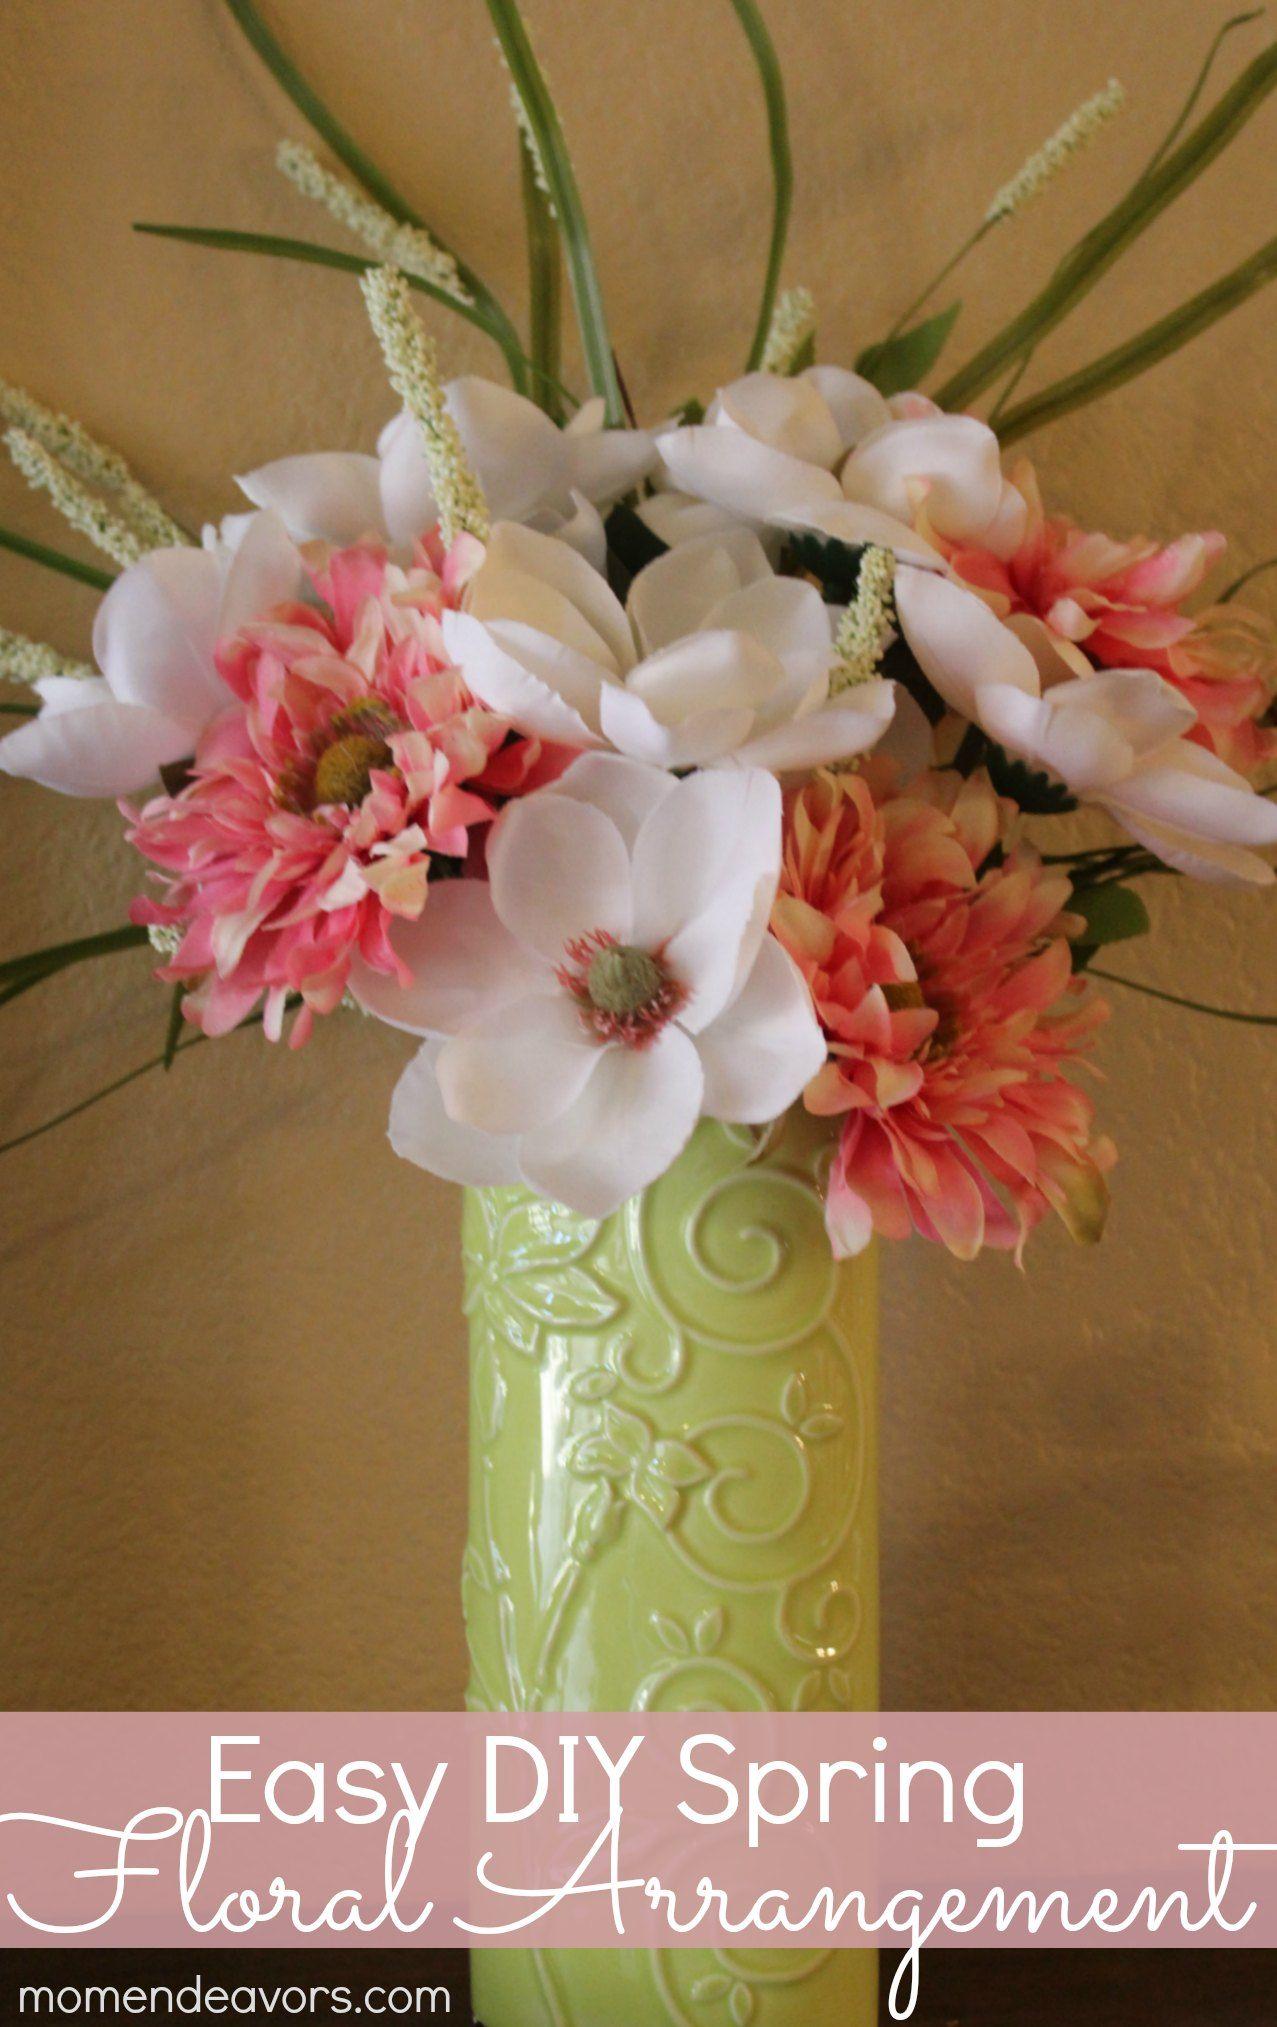 Easy Floral Arrangements easy diy spring floral arrangement | crafty 2 the core~diy galore